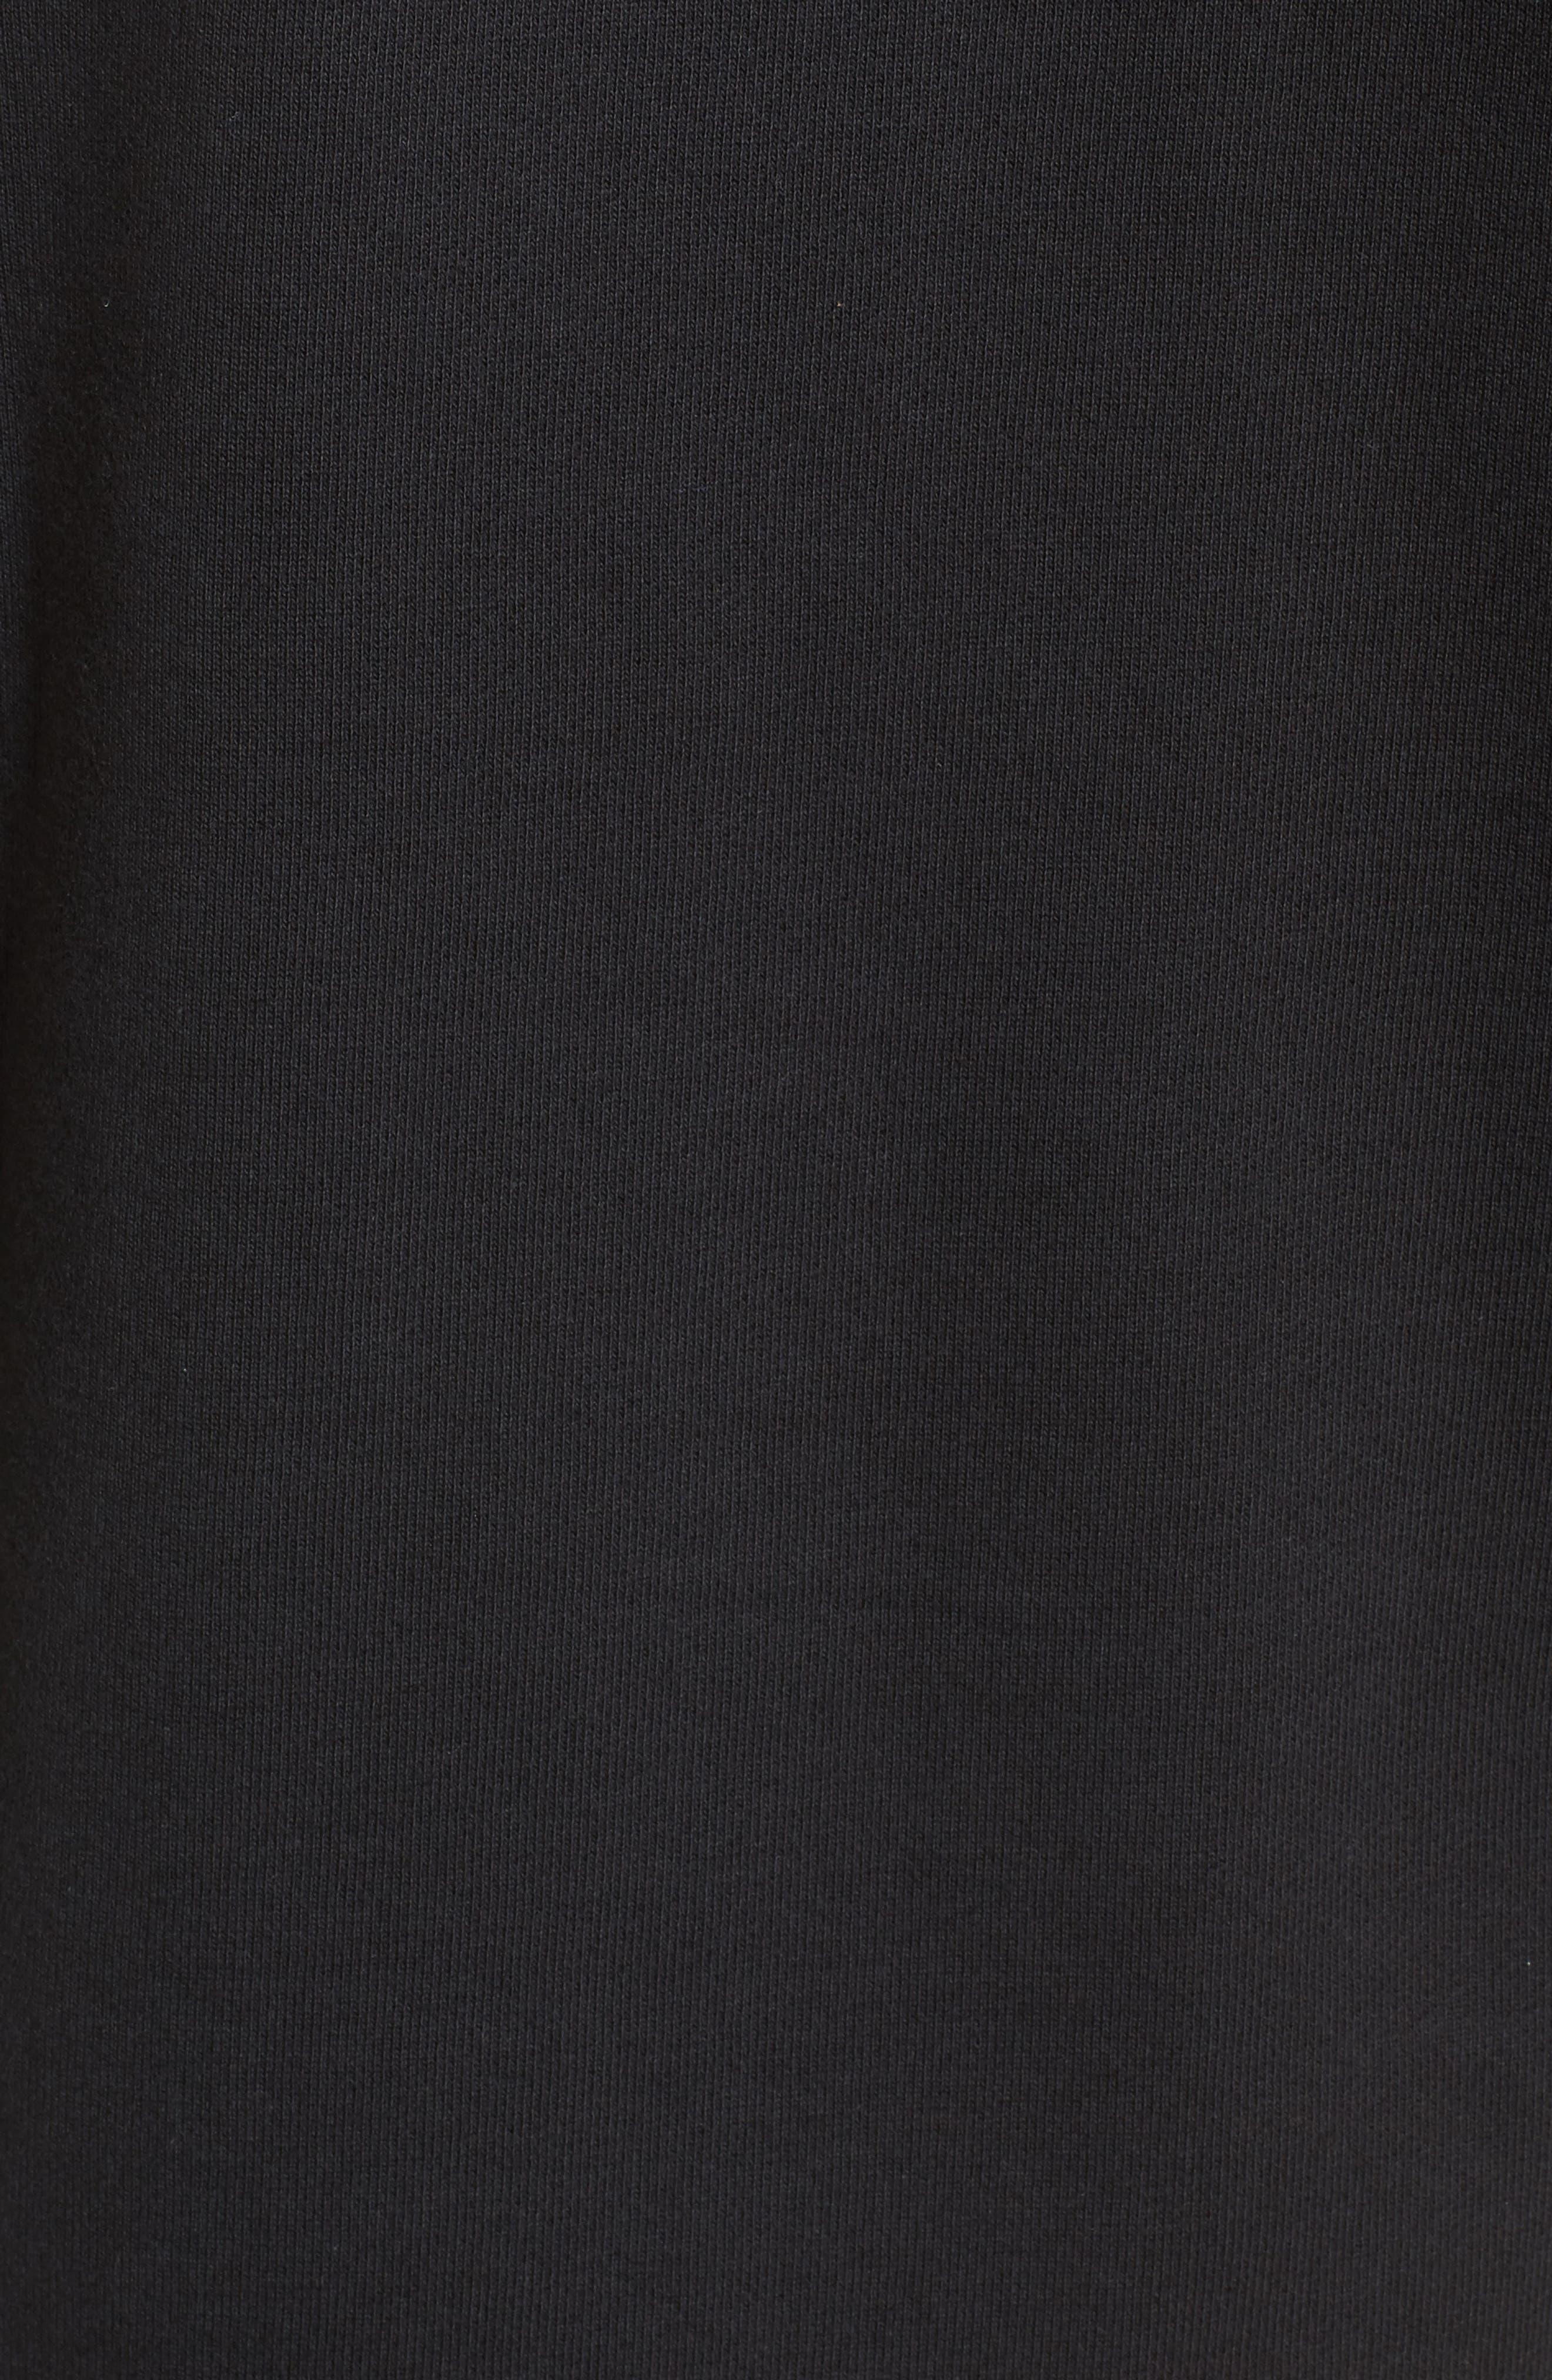 Sportswear City of Flight Hooded T-Shirt,                             Alternate thumbnail 5, color,                             010